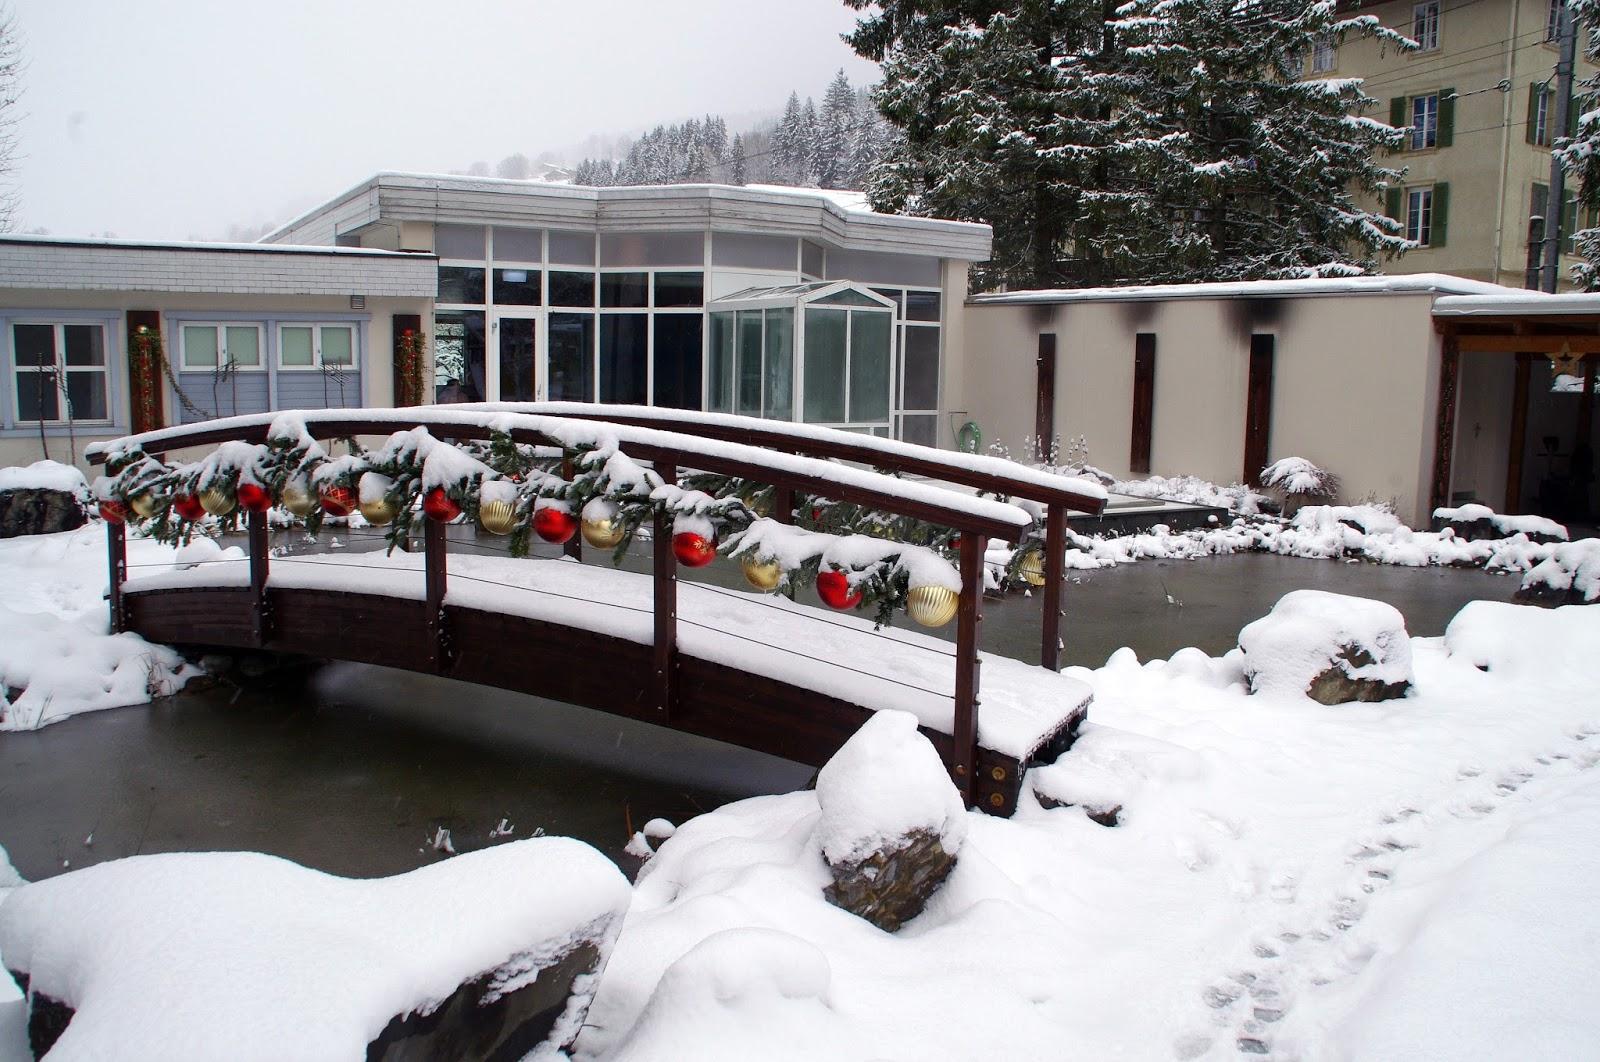 Hotel Belvedere Grindelwald Bridge and Pond